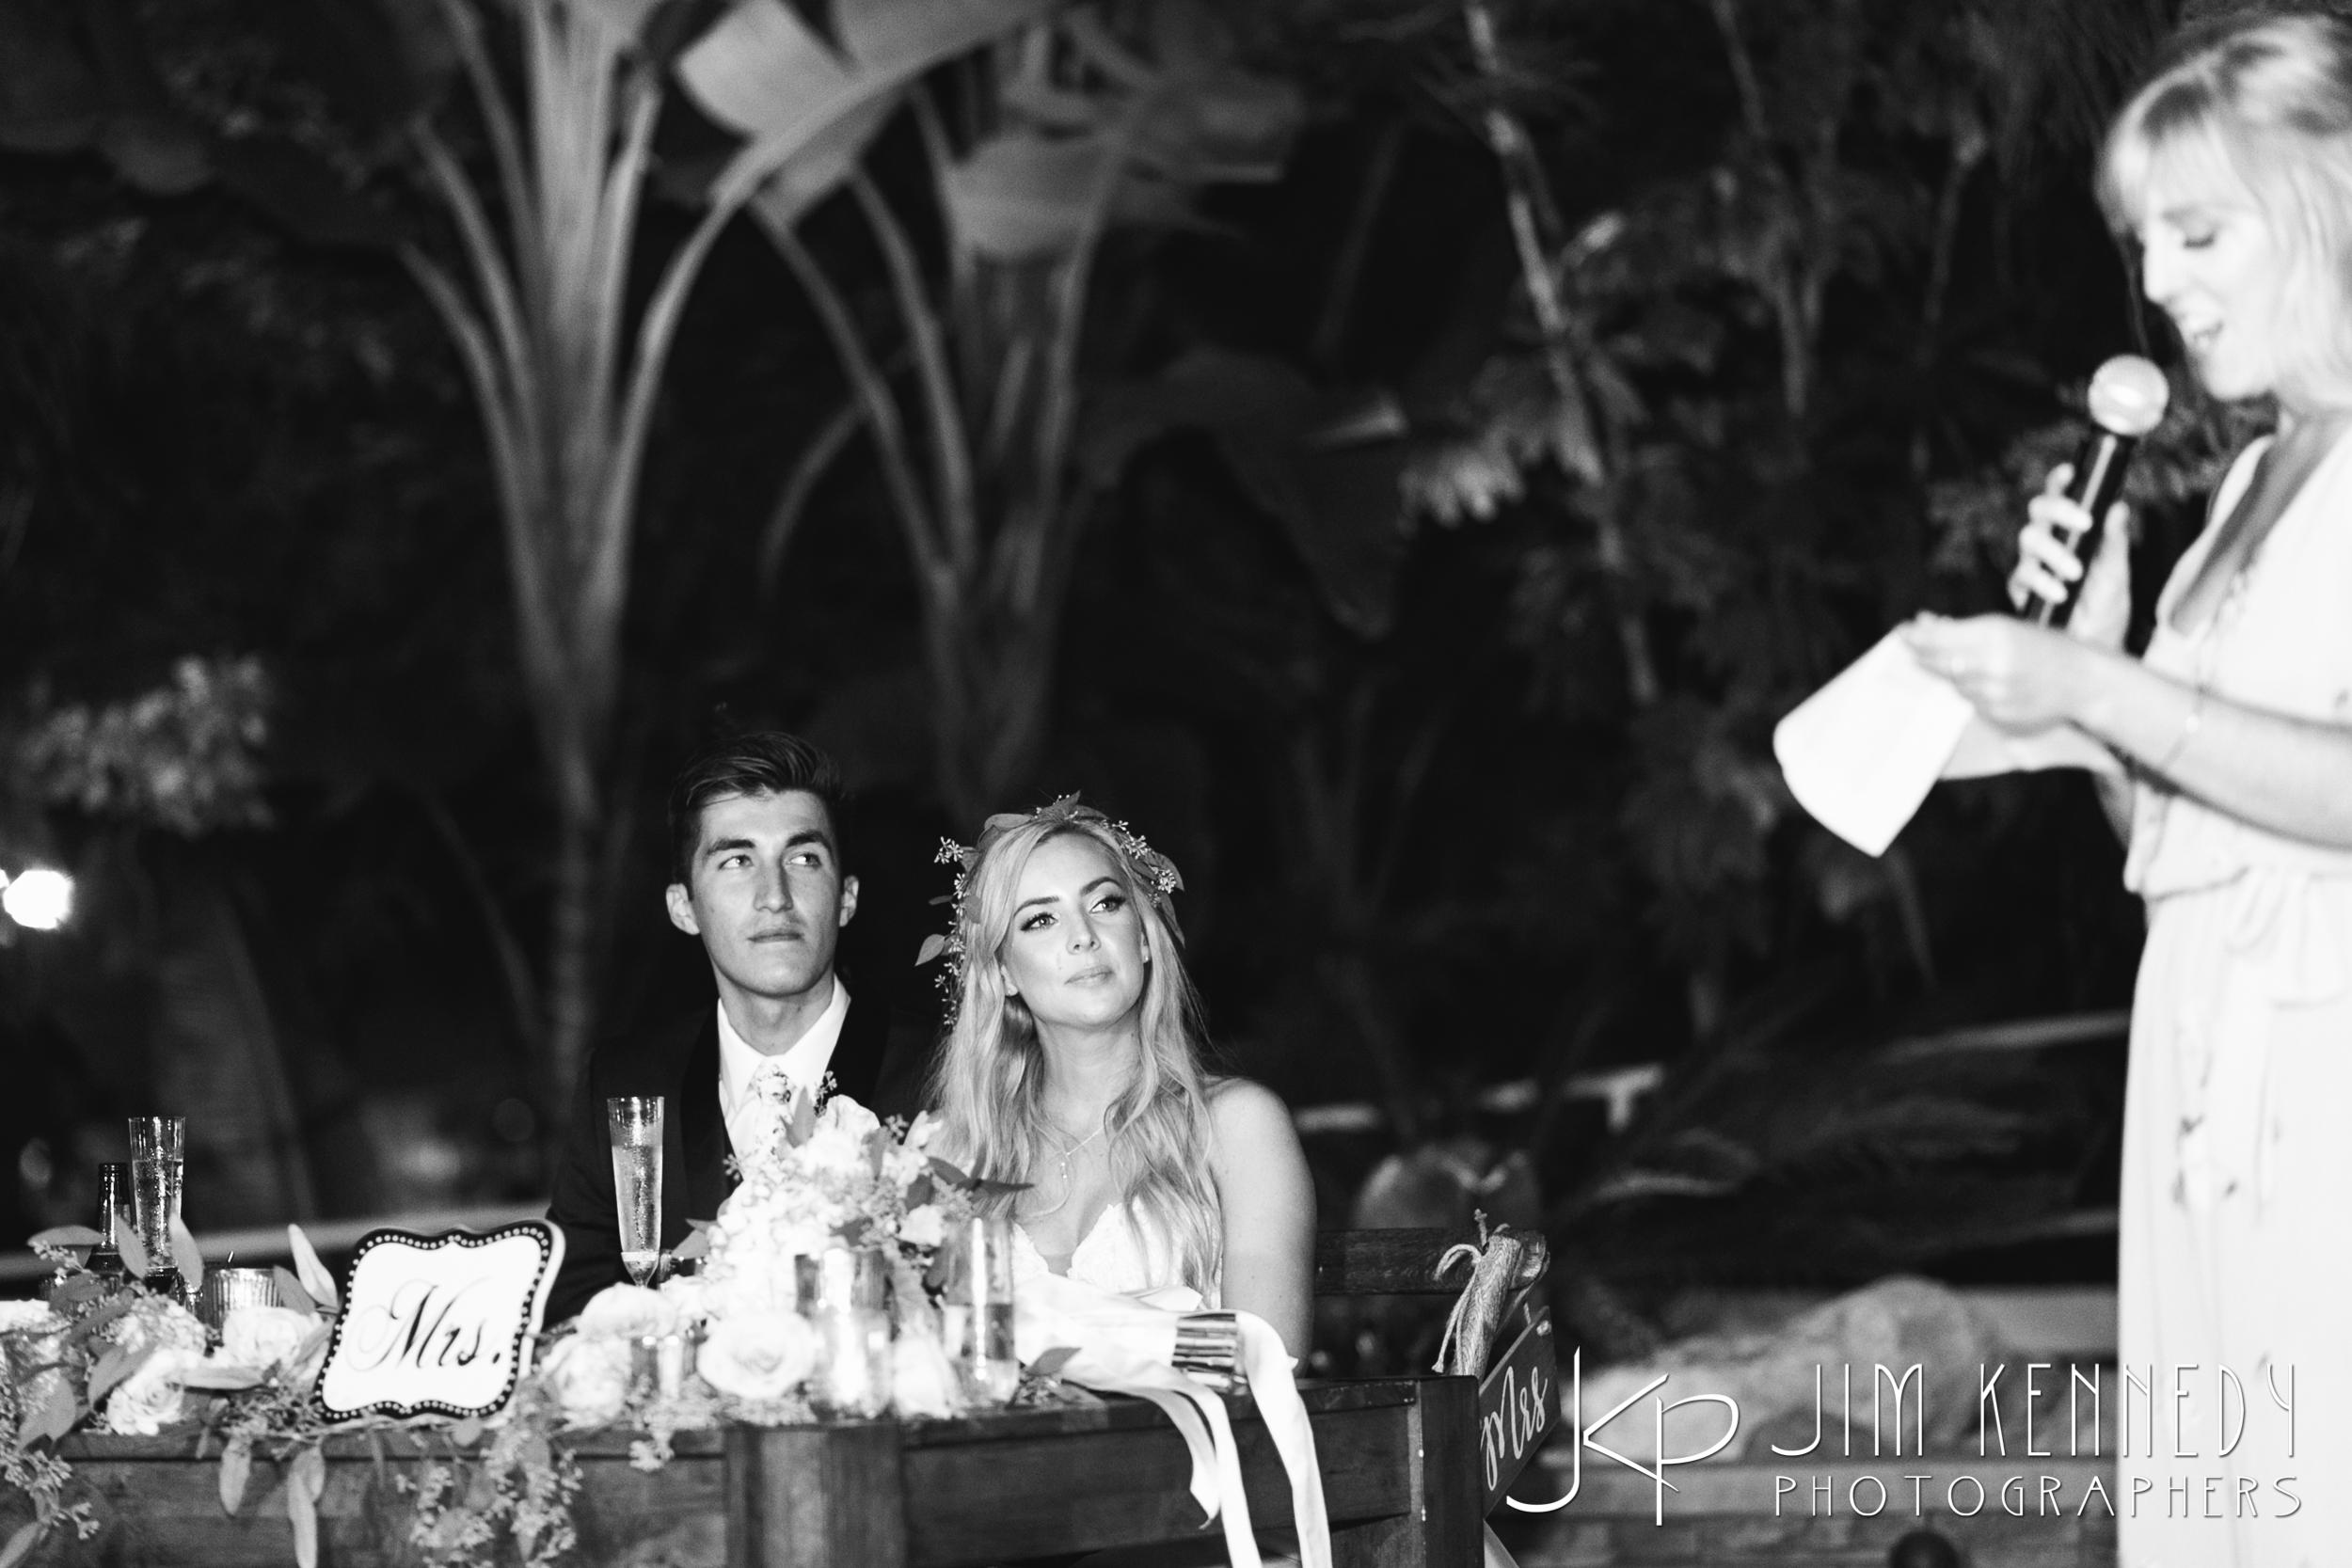 huntington_beach_wedding-5237.jpg